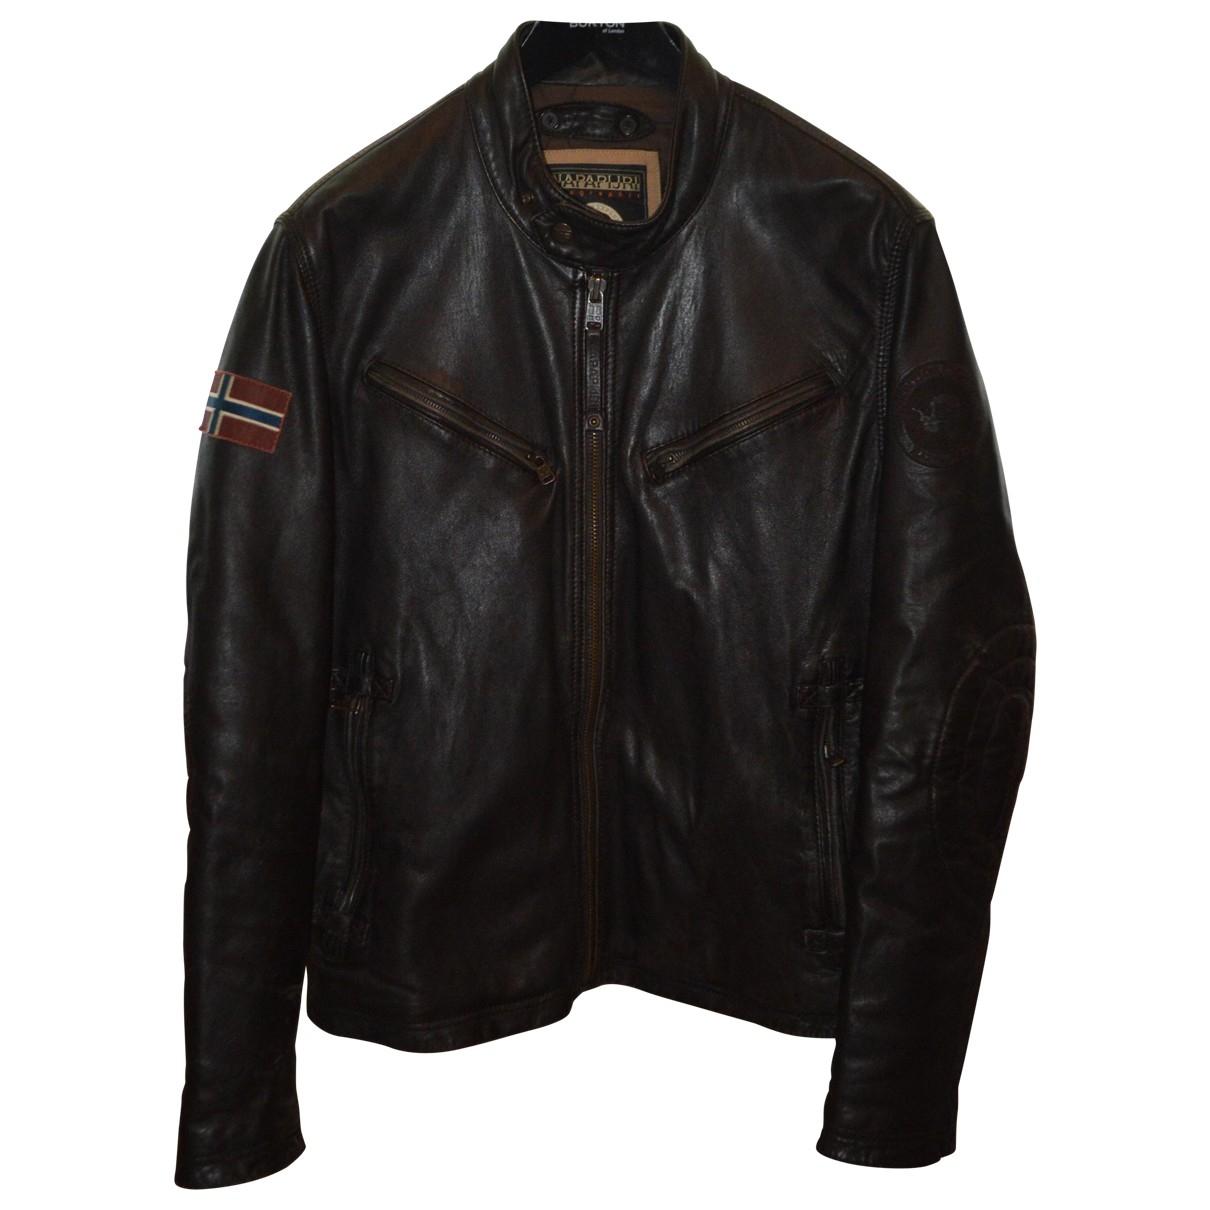 Napapijri \N Brown Leather jacket  for Men XL International